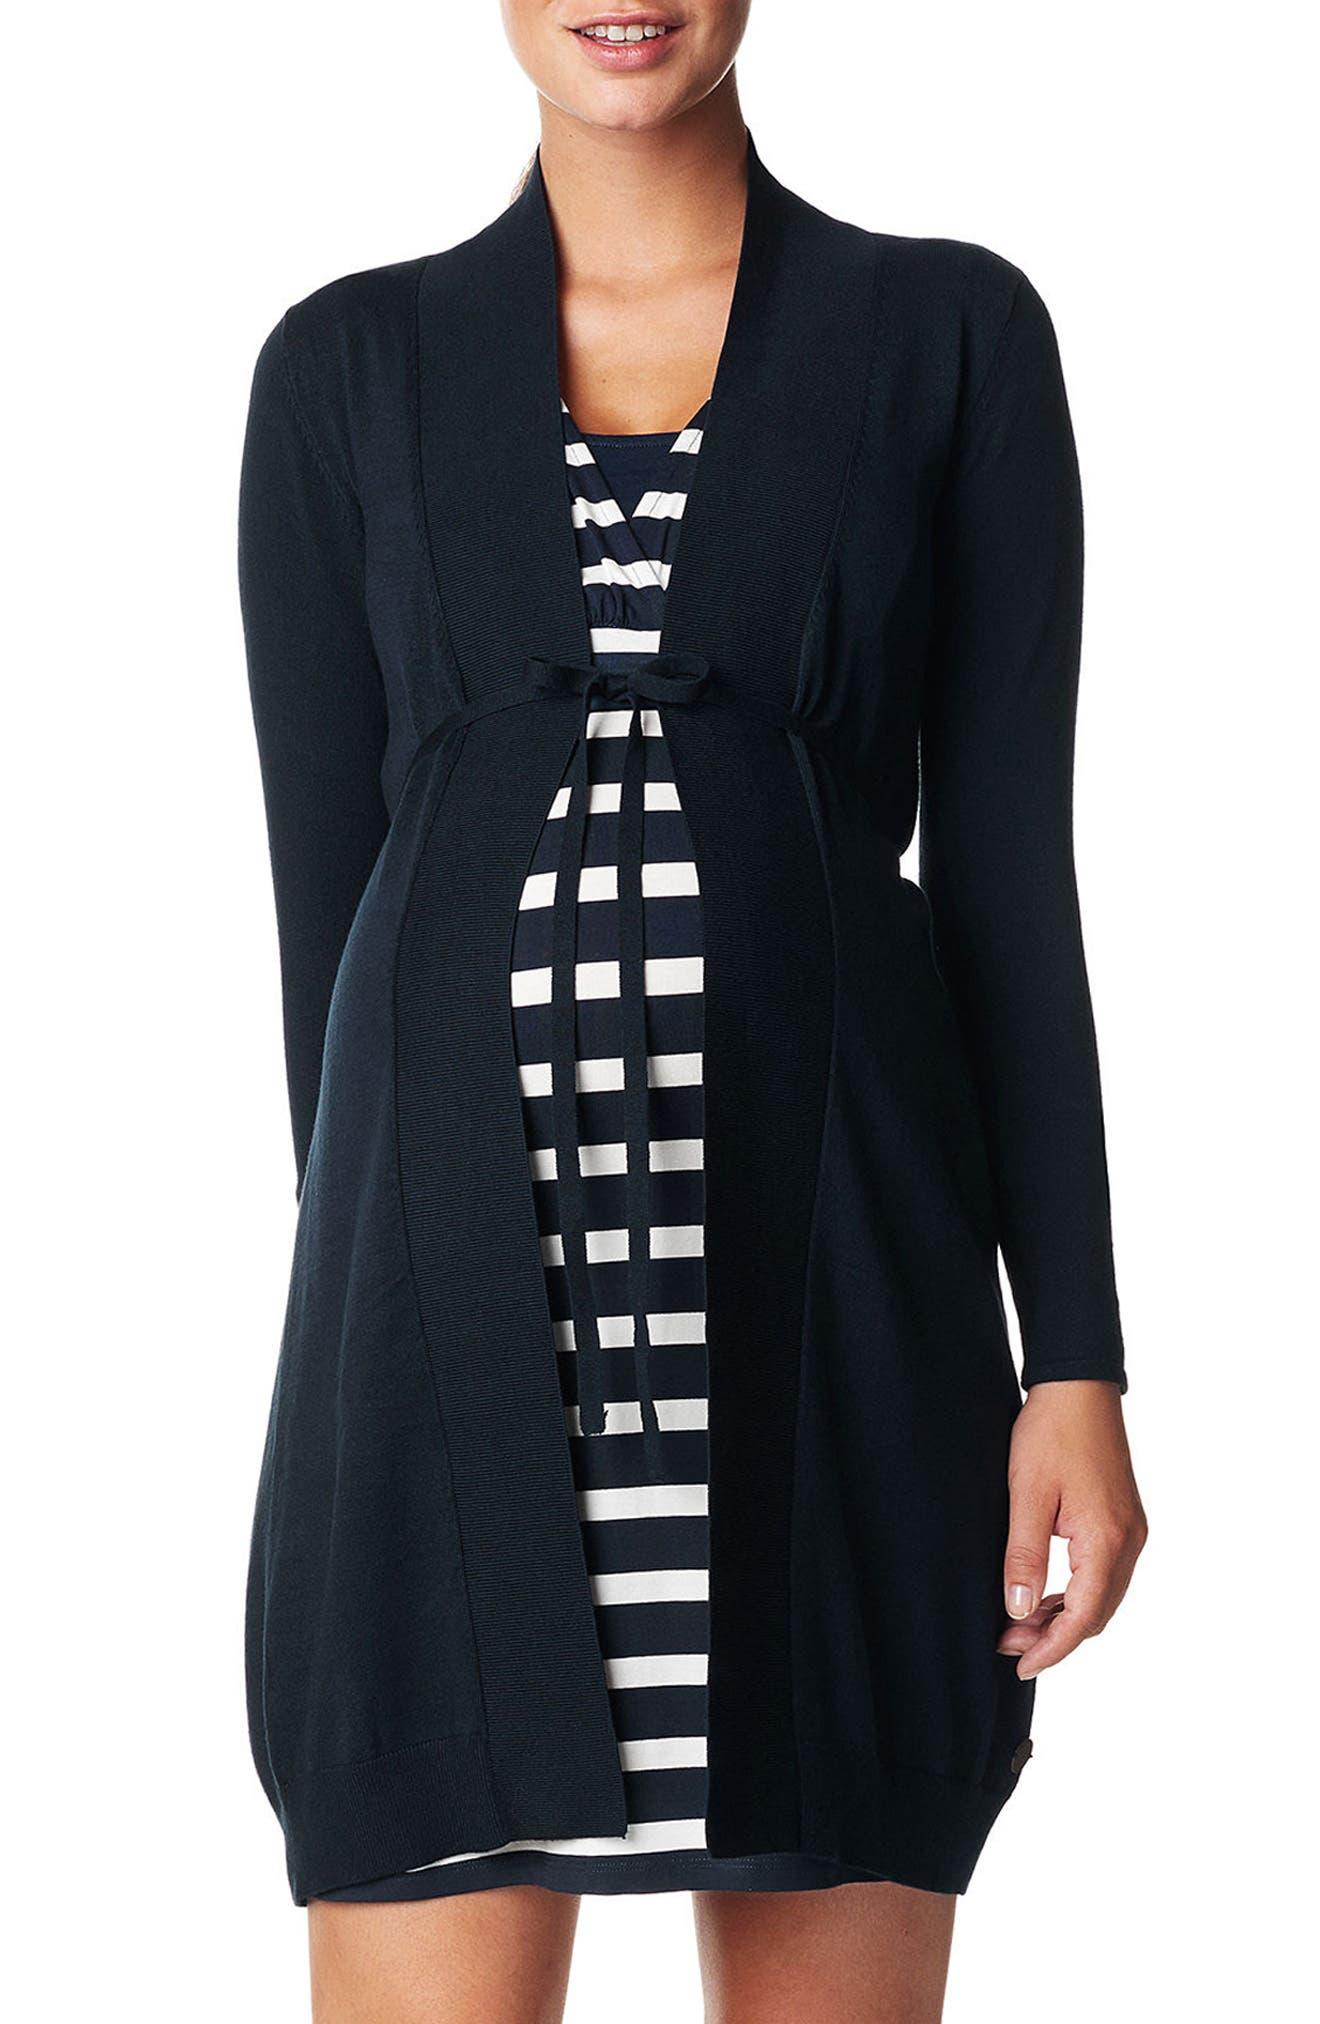 Jessi Knit Cardigan,                         Main,                         color, BLACK